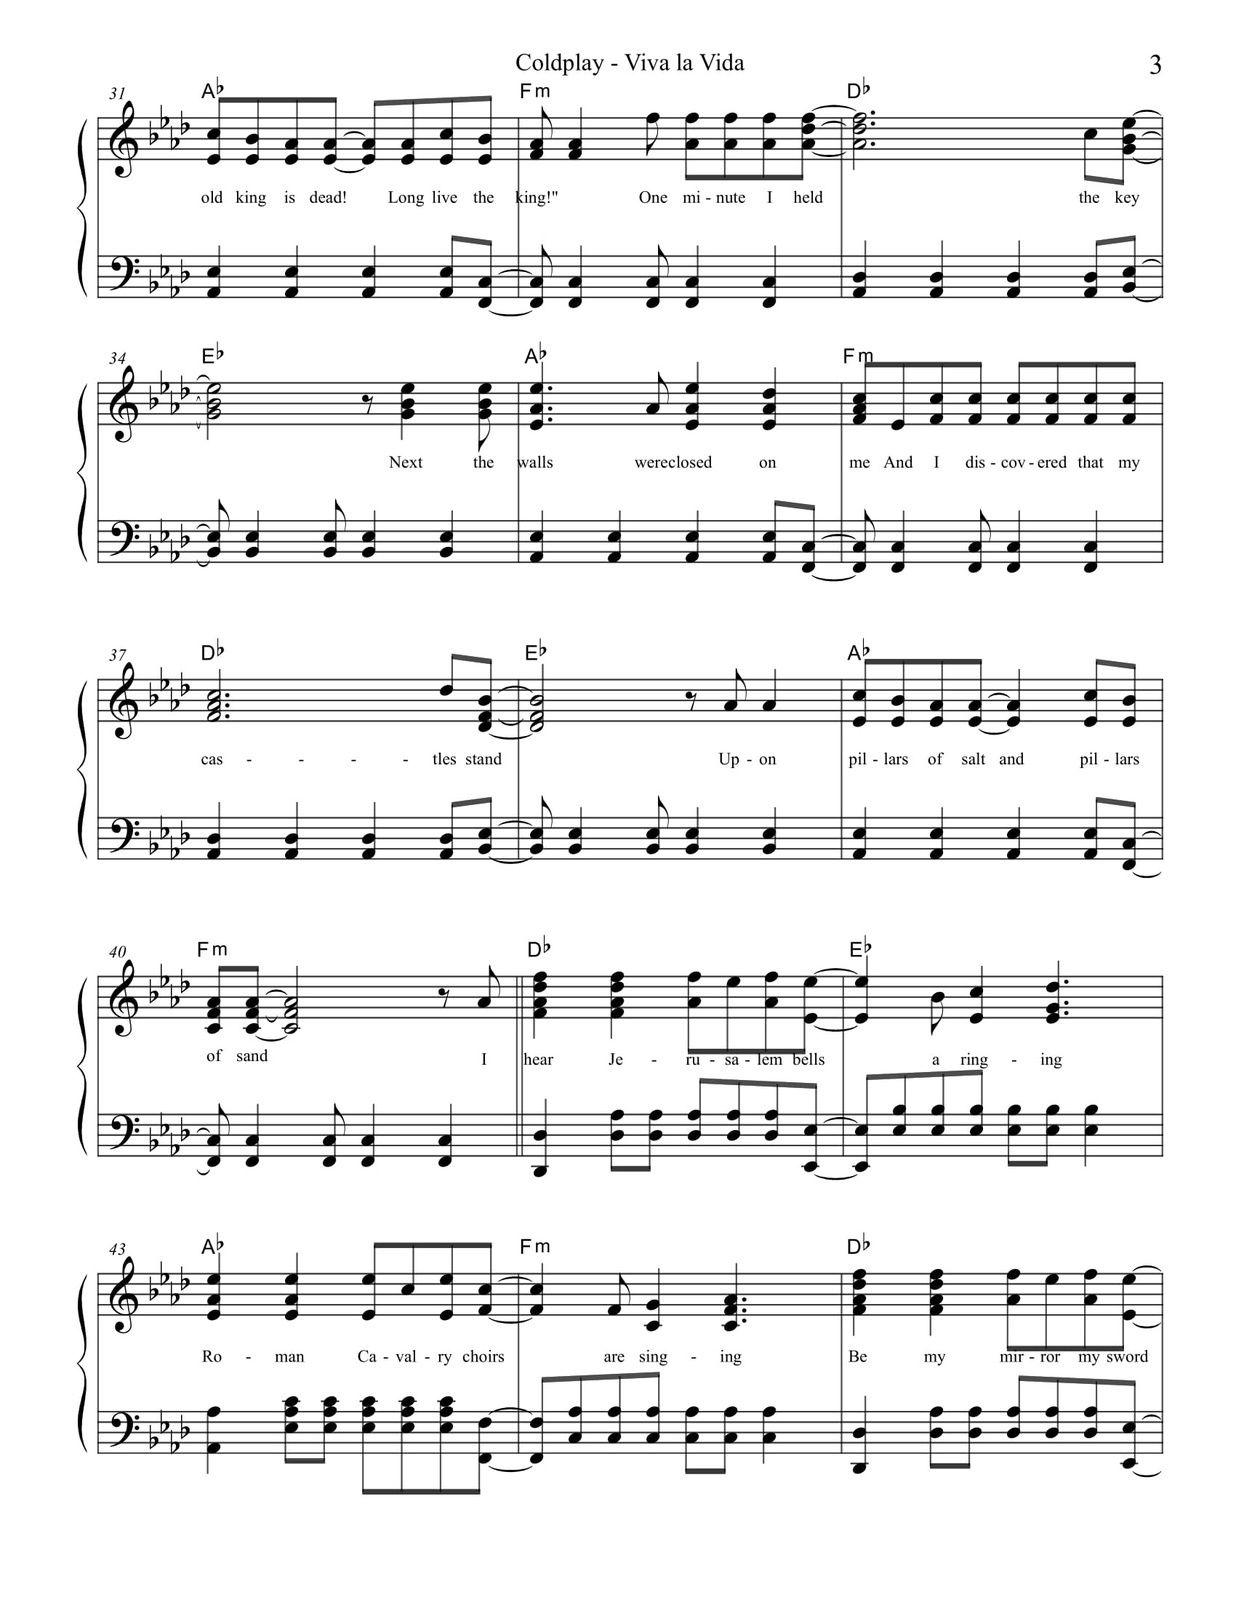 Viva La Vida Easy Key Coldplay Pianobragsongs Com Met